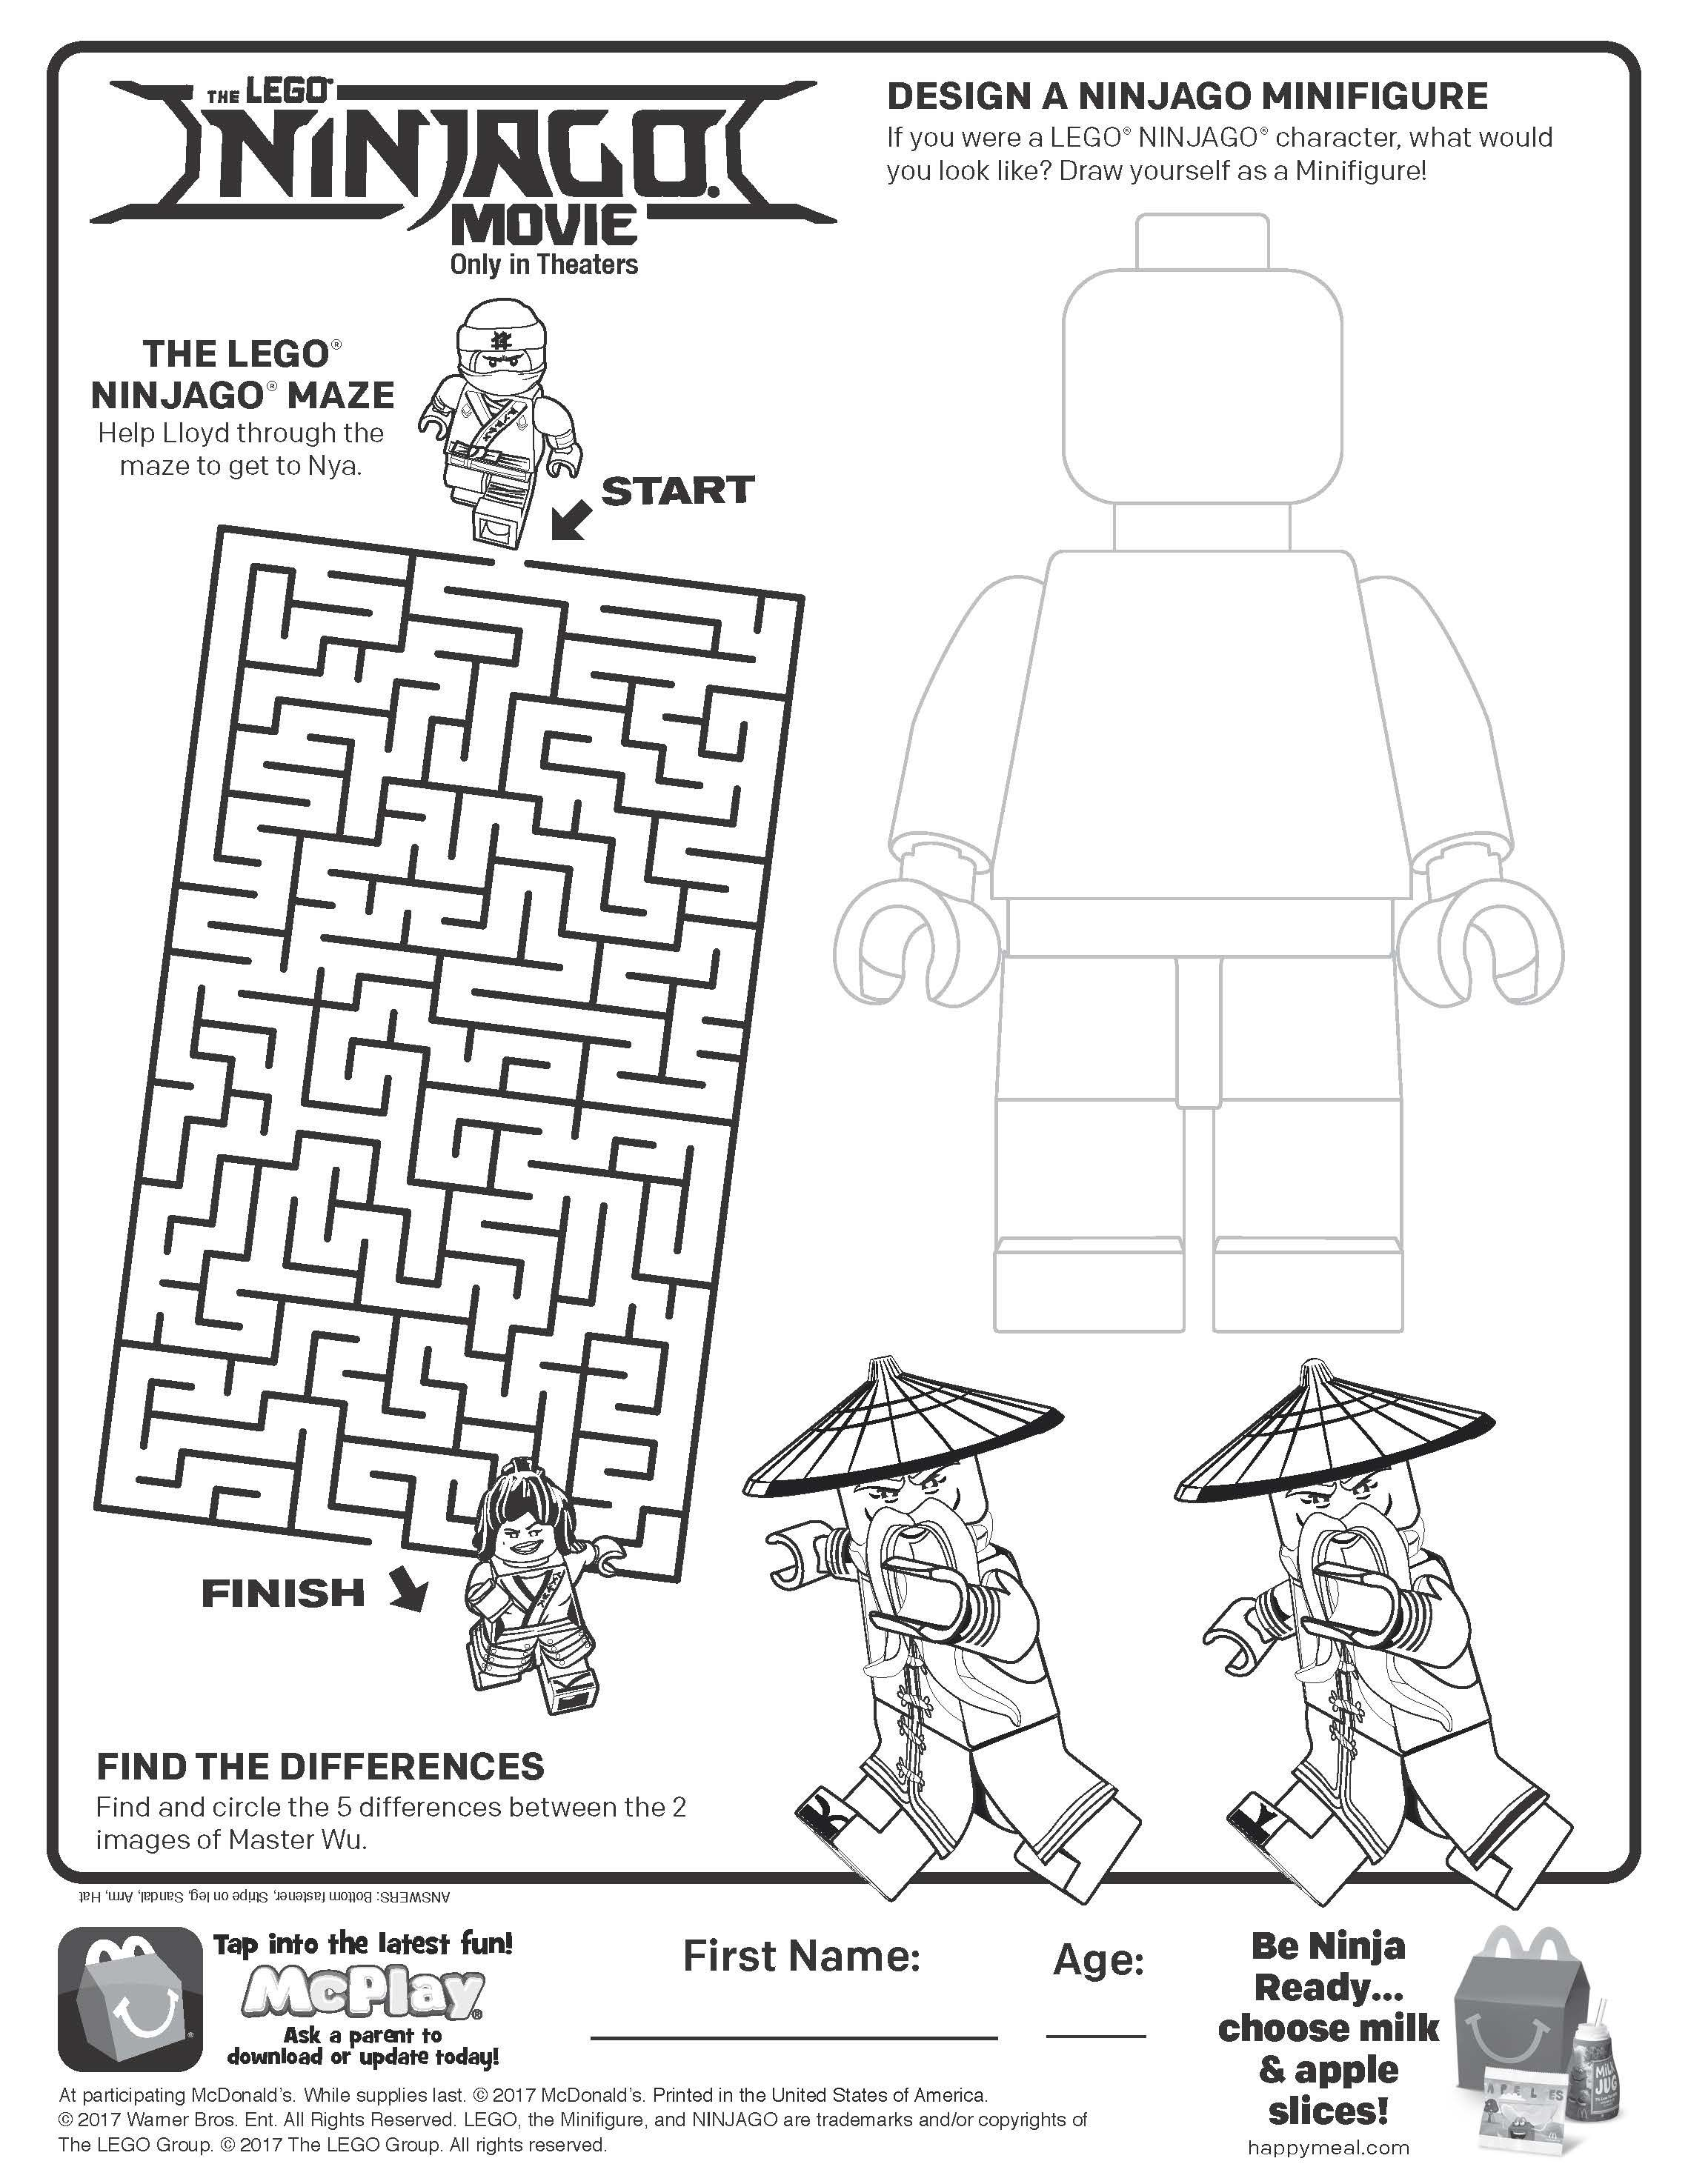 Legoninjago Activity Us R1 S1 S3 S6 S5